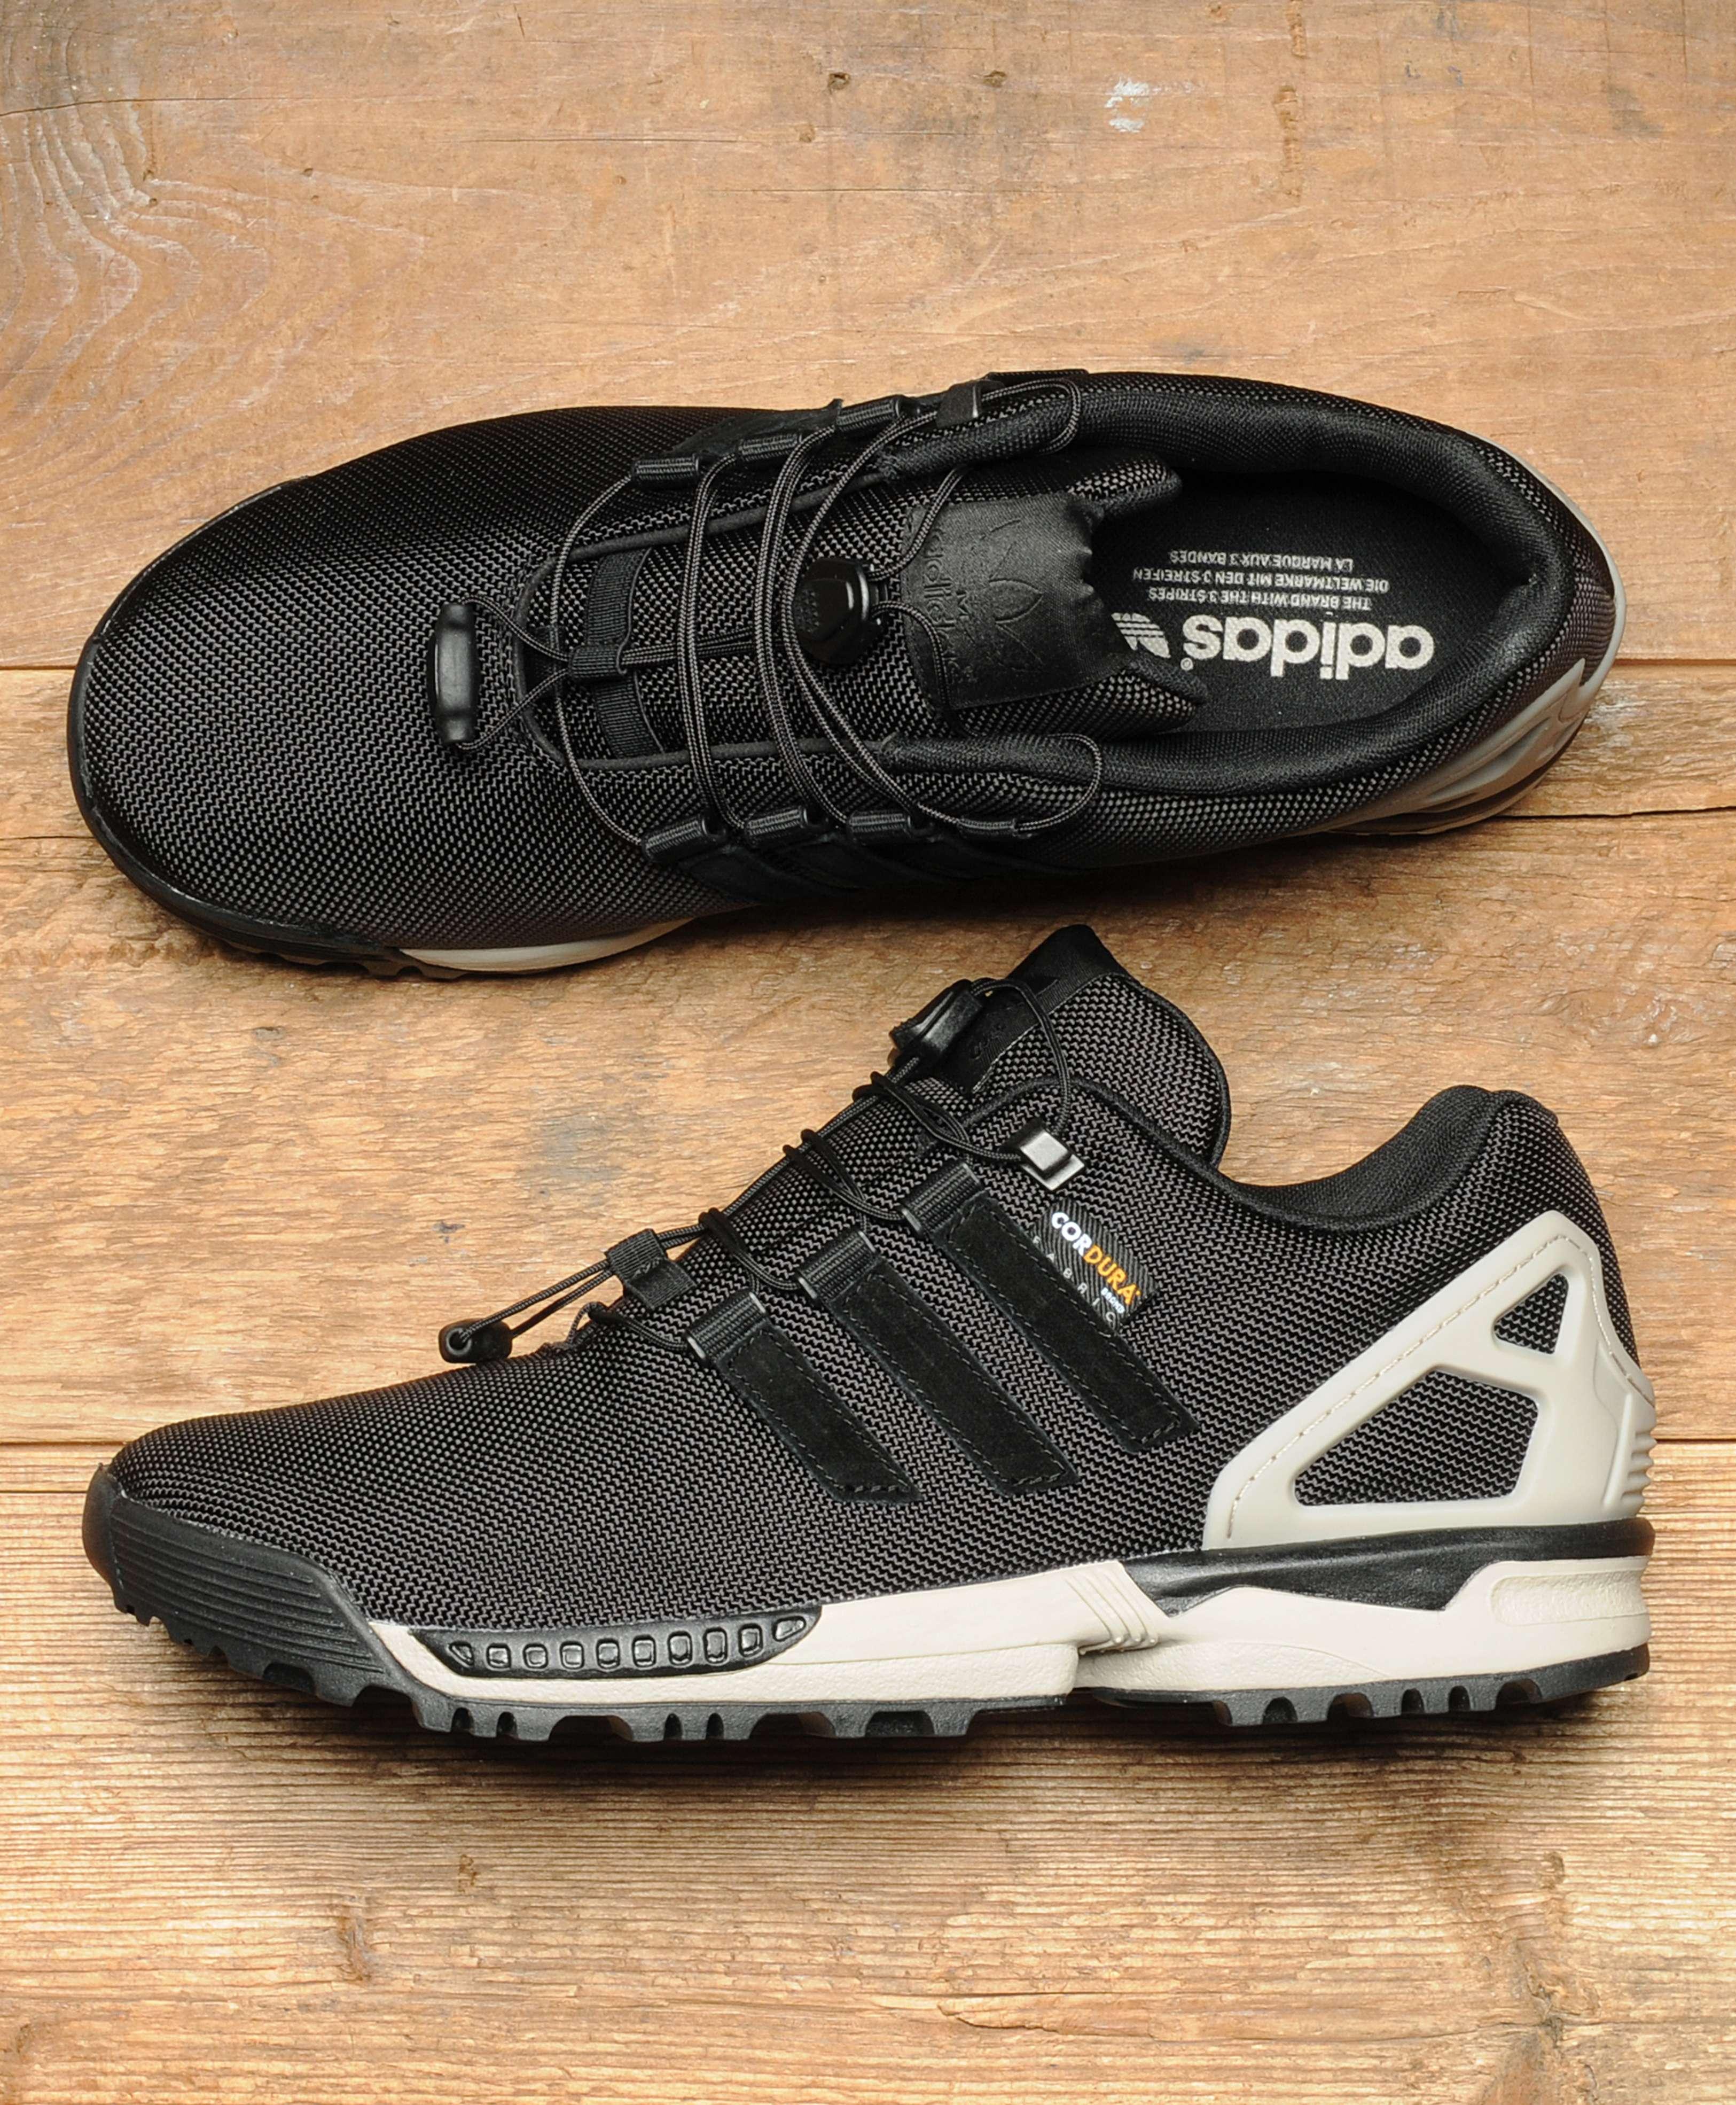 huge selection of 52407 df6ba adidas Originals ZX Flux Winter | scotts Menswear